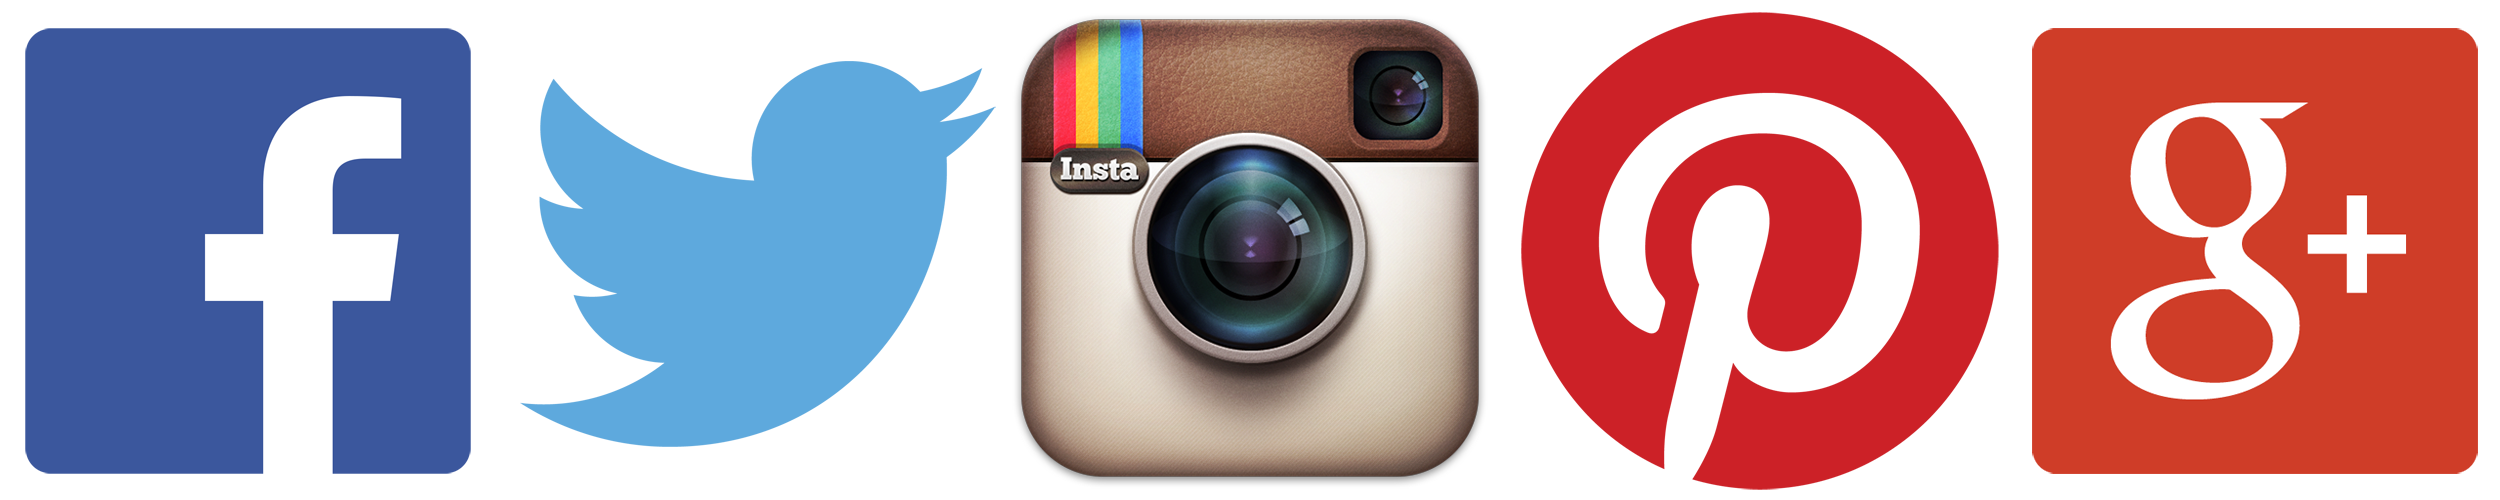 2500x500 Facebook Instagram Twitter Logos